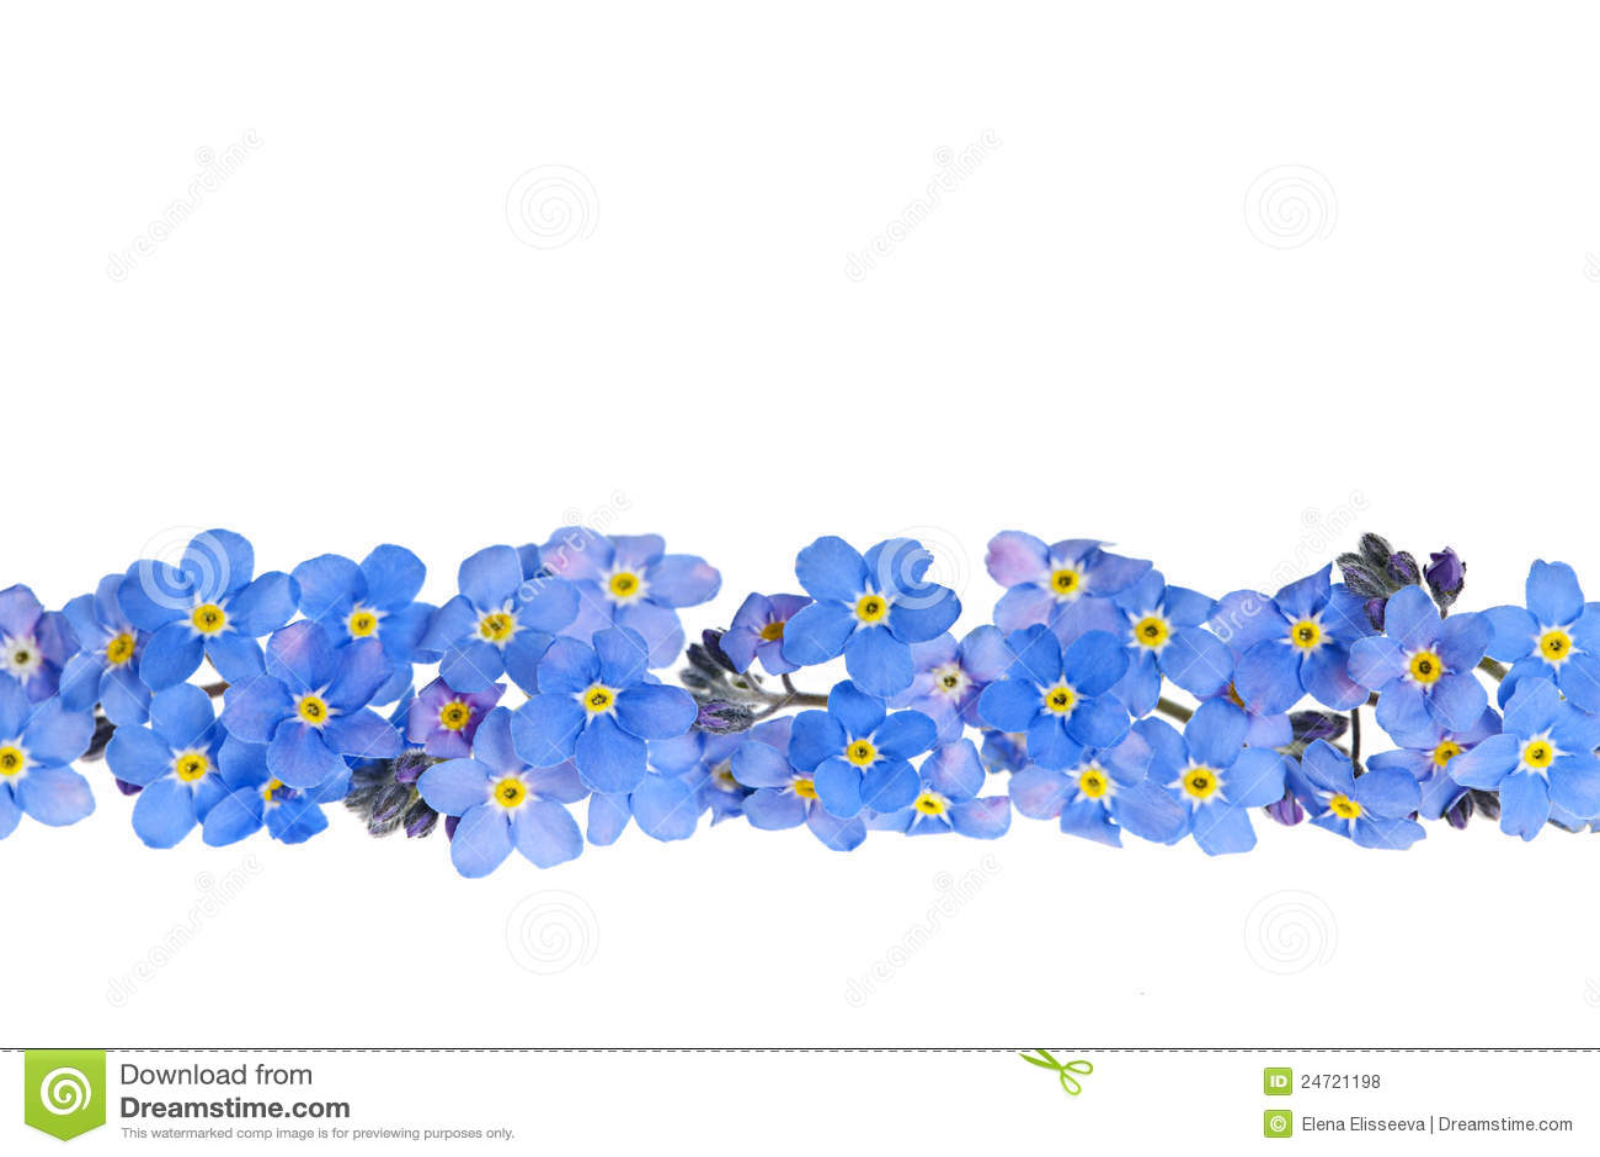 blue spring flower border royalty free stock photos image 24721198